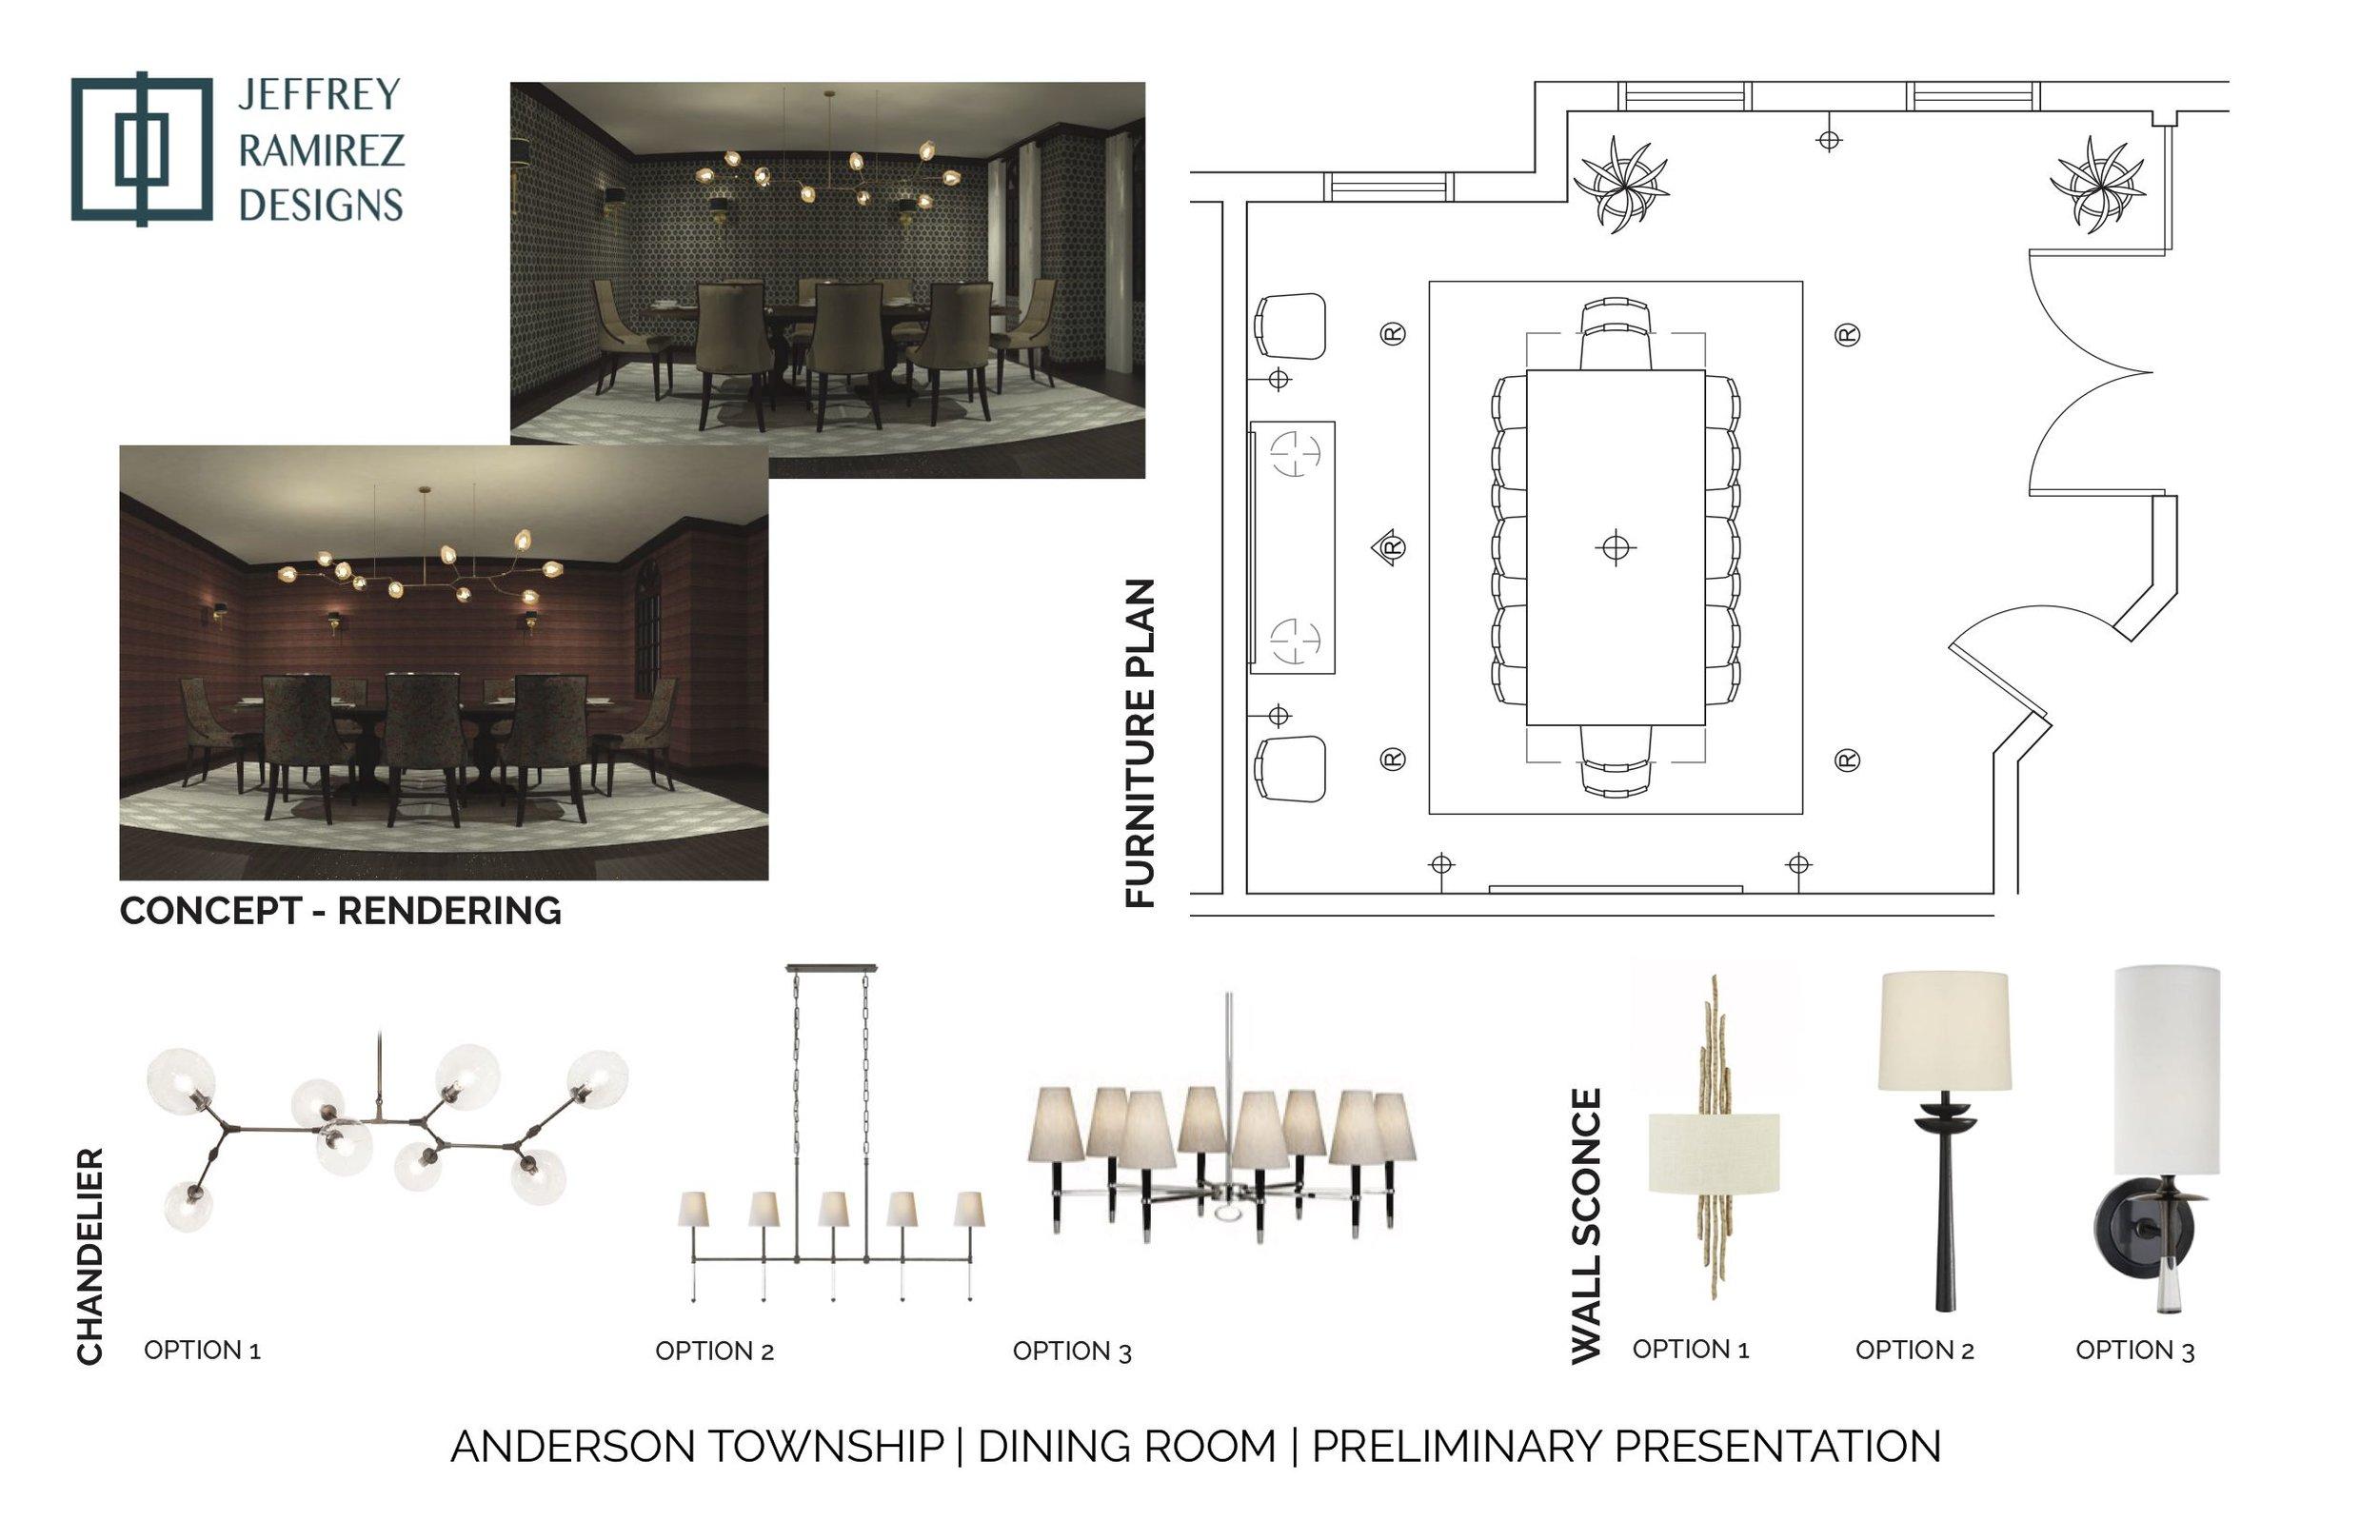 JEFFREY-RAMIREZ-DESIGNS_ANDERSON-TOWNSHIP-DINING-ROOM-INTERIOR-DESIGN-compressor.jpg